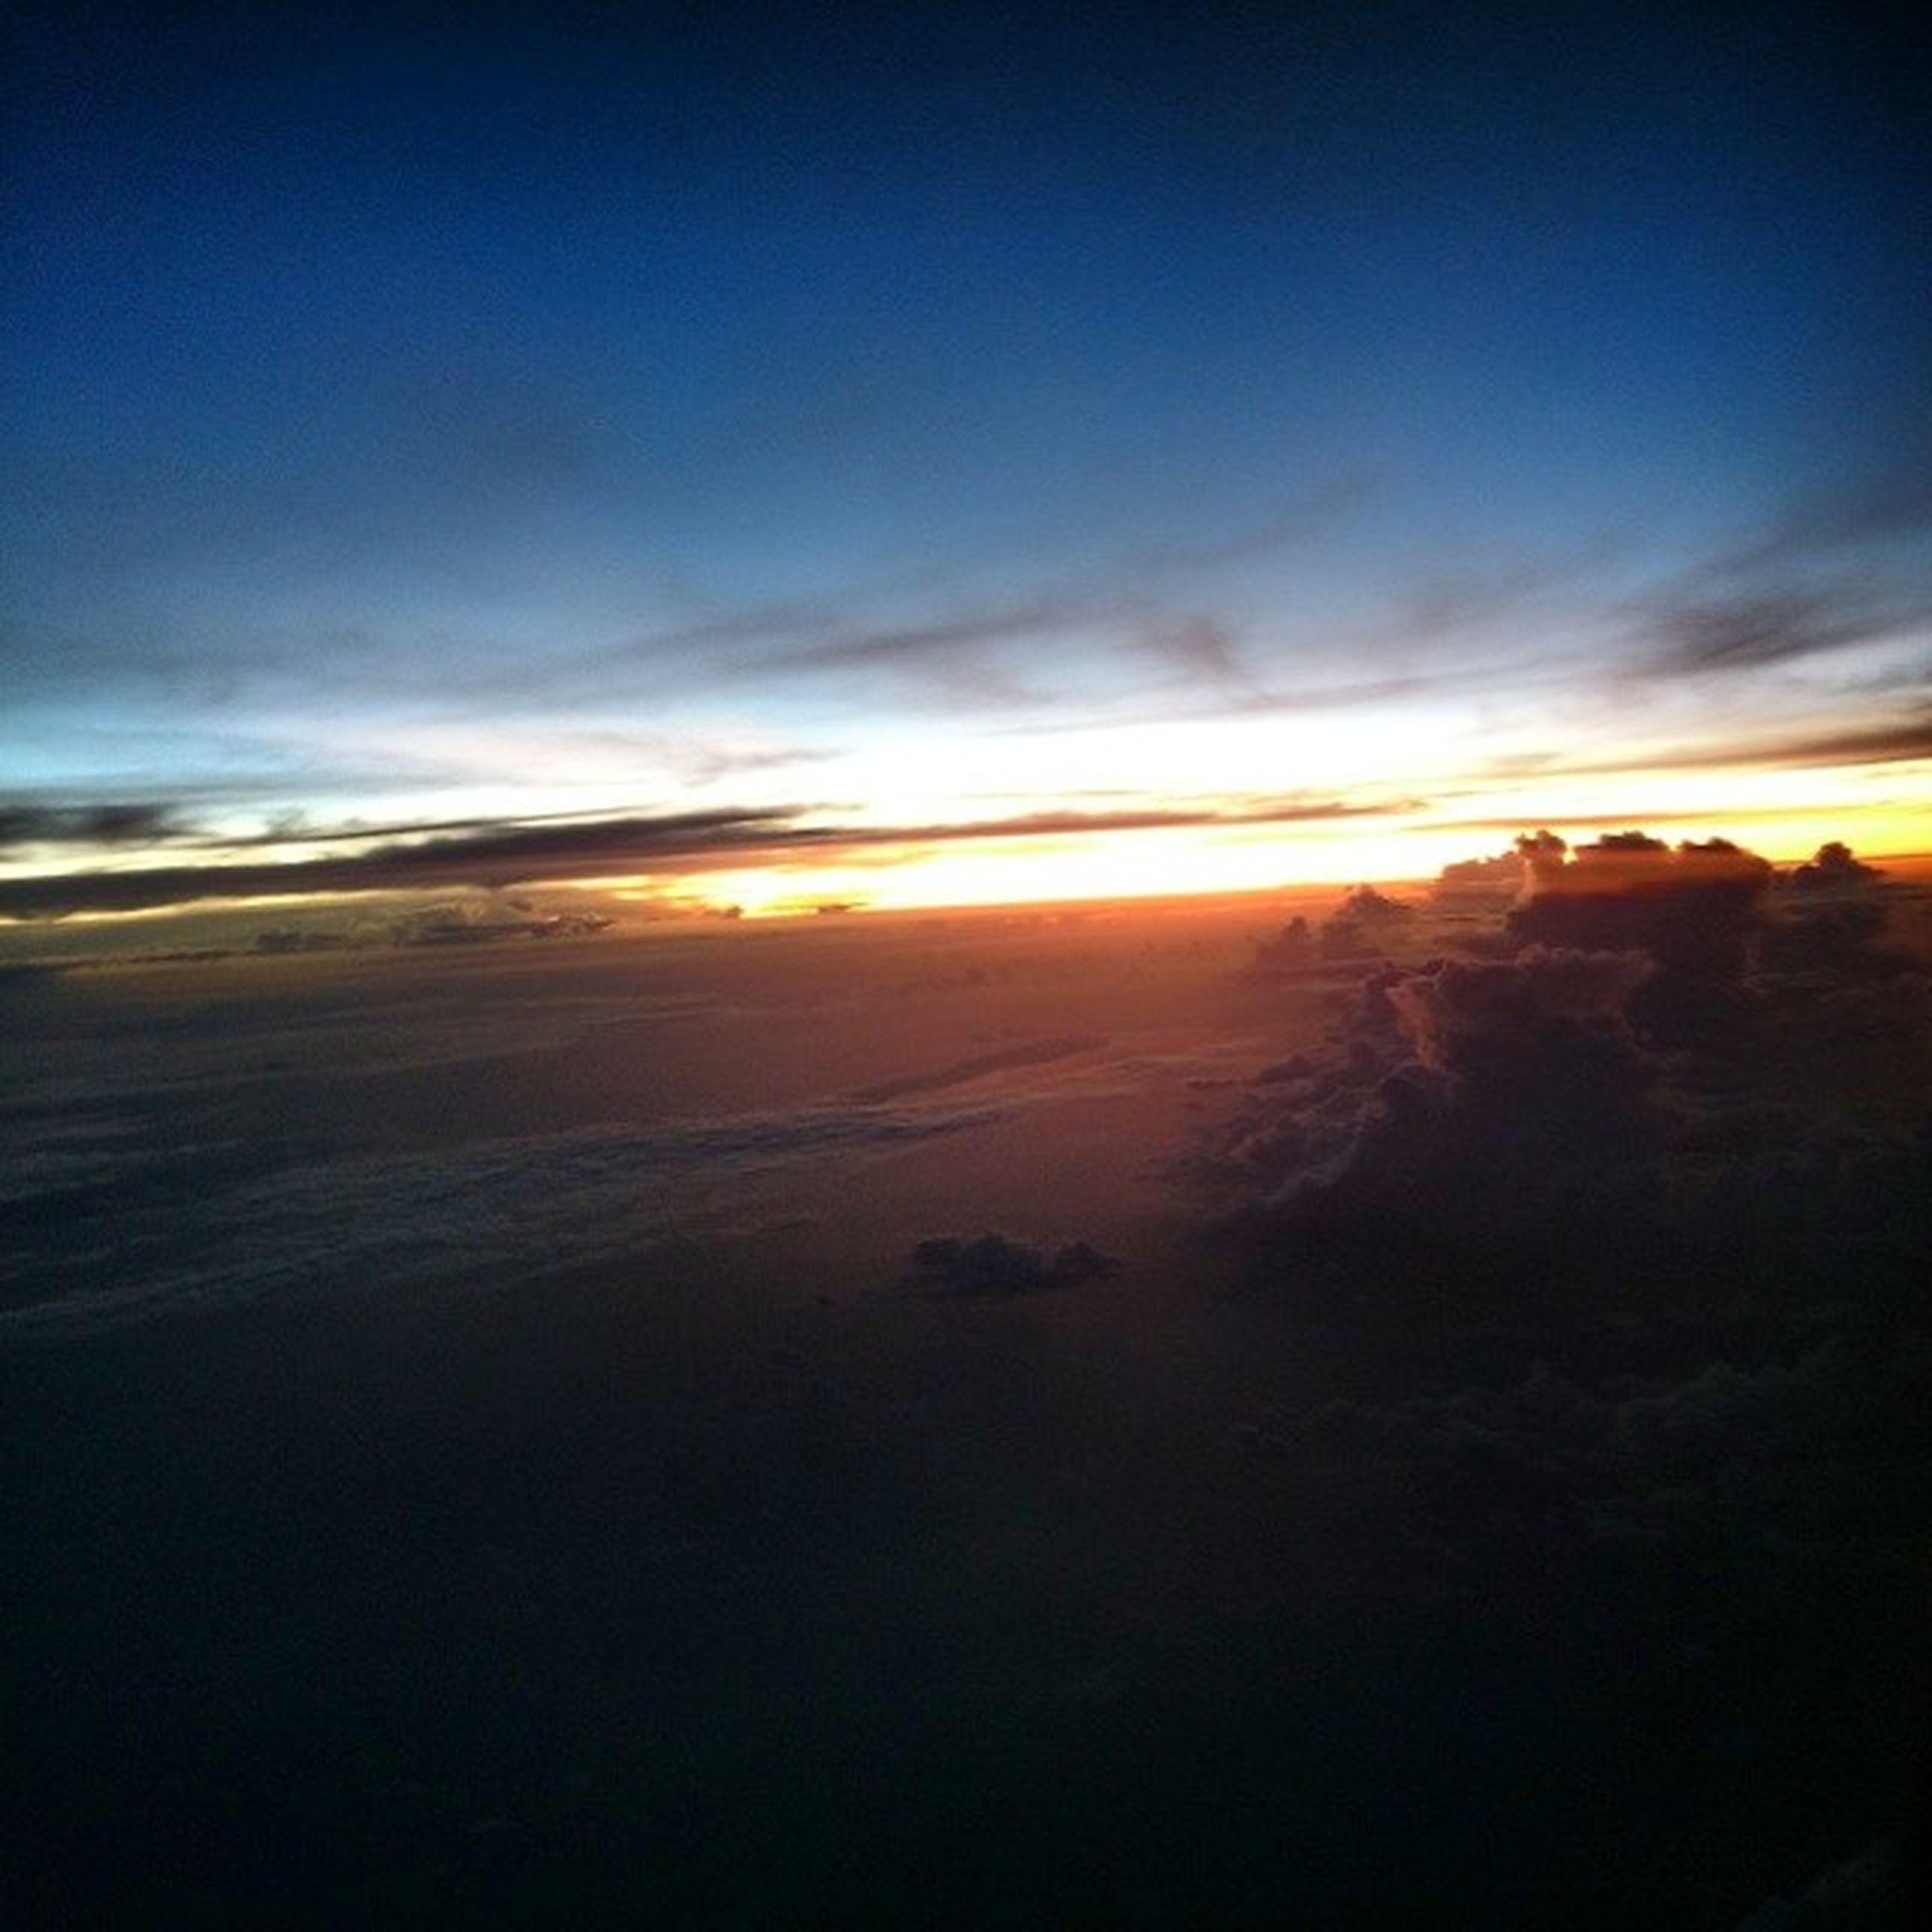 sunset, scenics, tranquil scene, sky, beauty in nature, tranquility, sun, cloud - sky, nature, idyllic, orange color, silhouette, sunlight, sea, cloud, landscape, beach, outdoors, horizon over water, no people